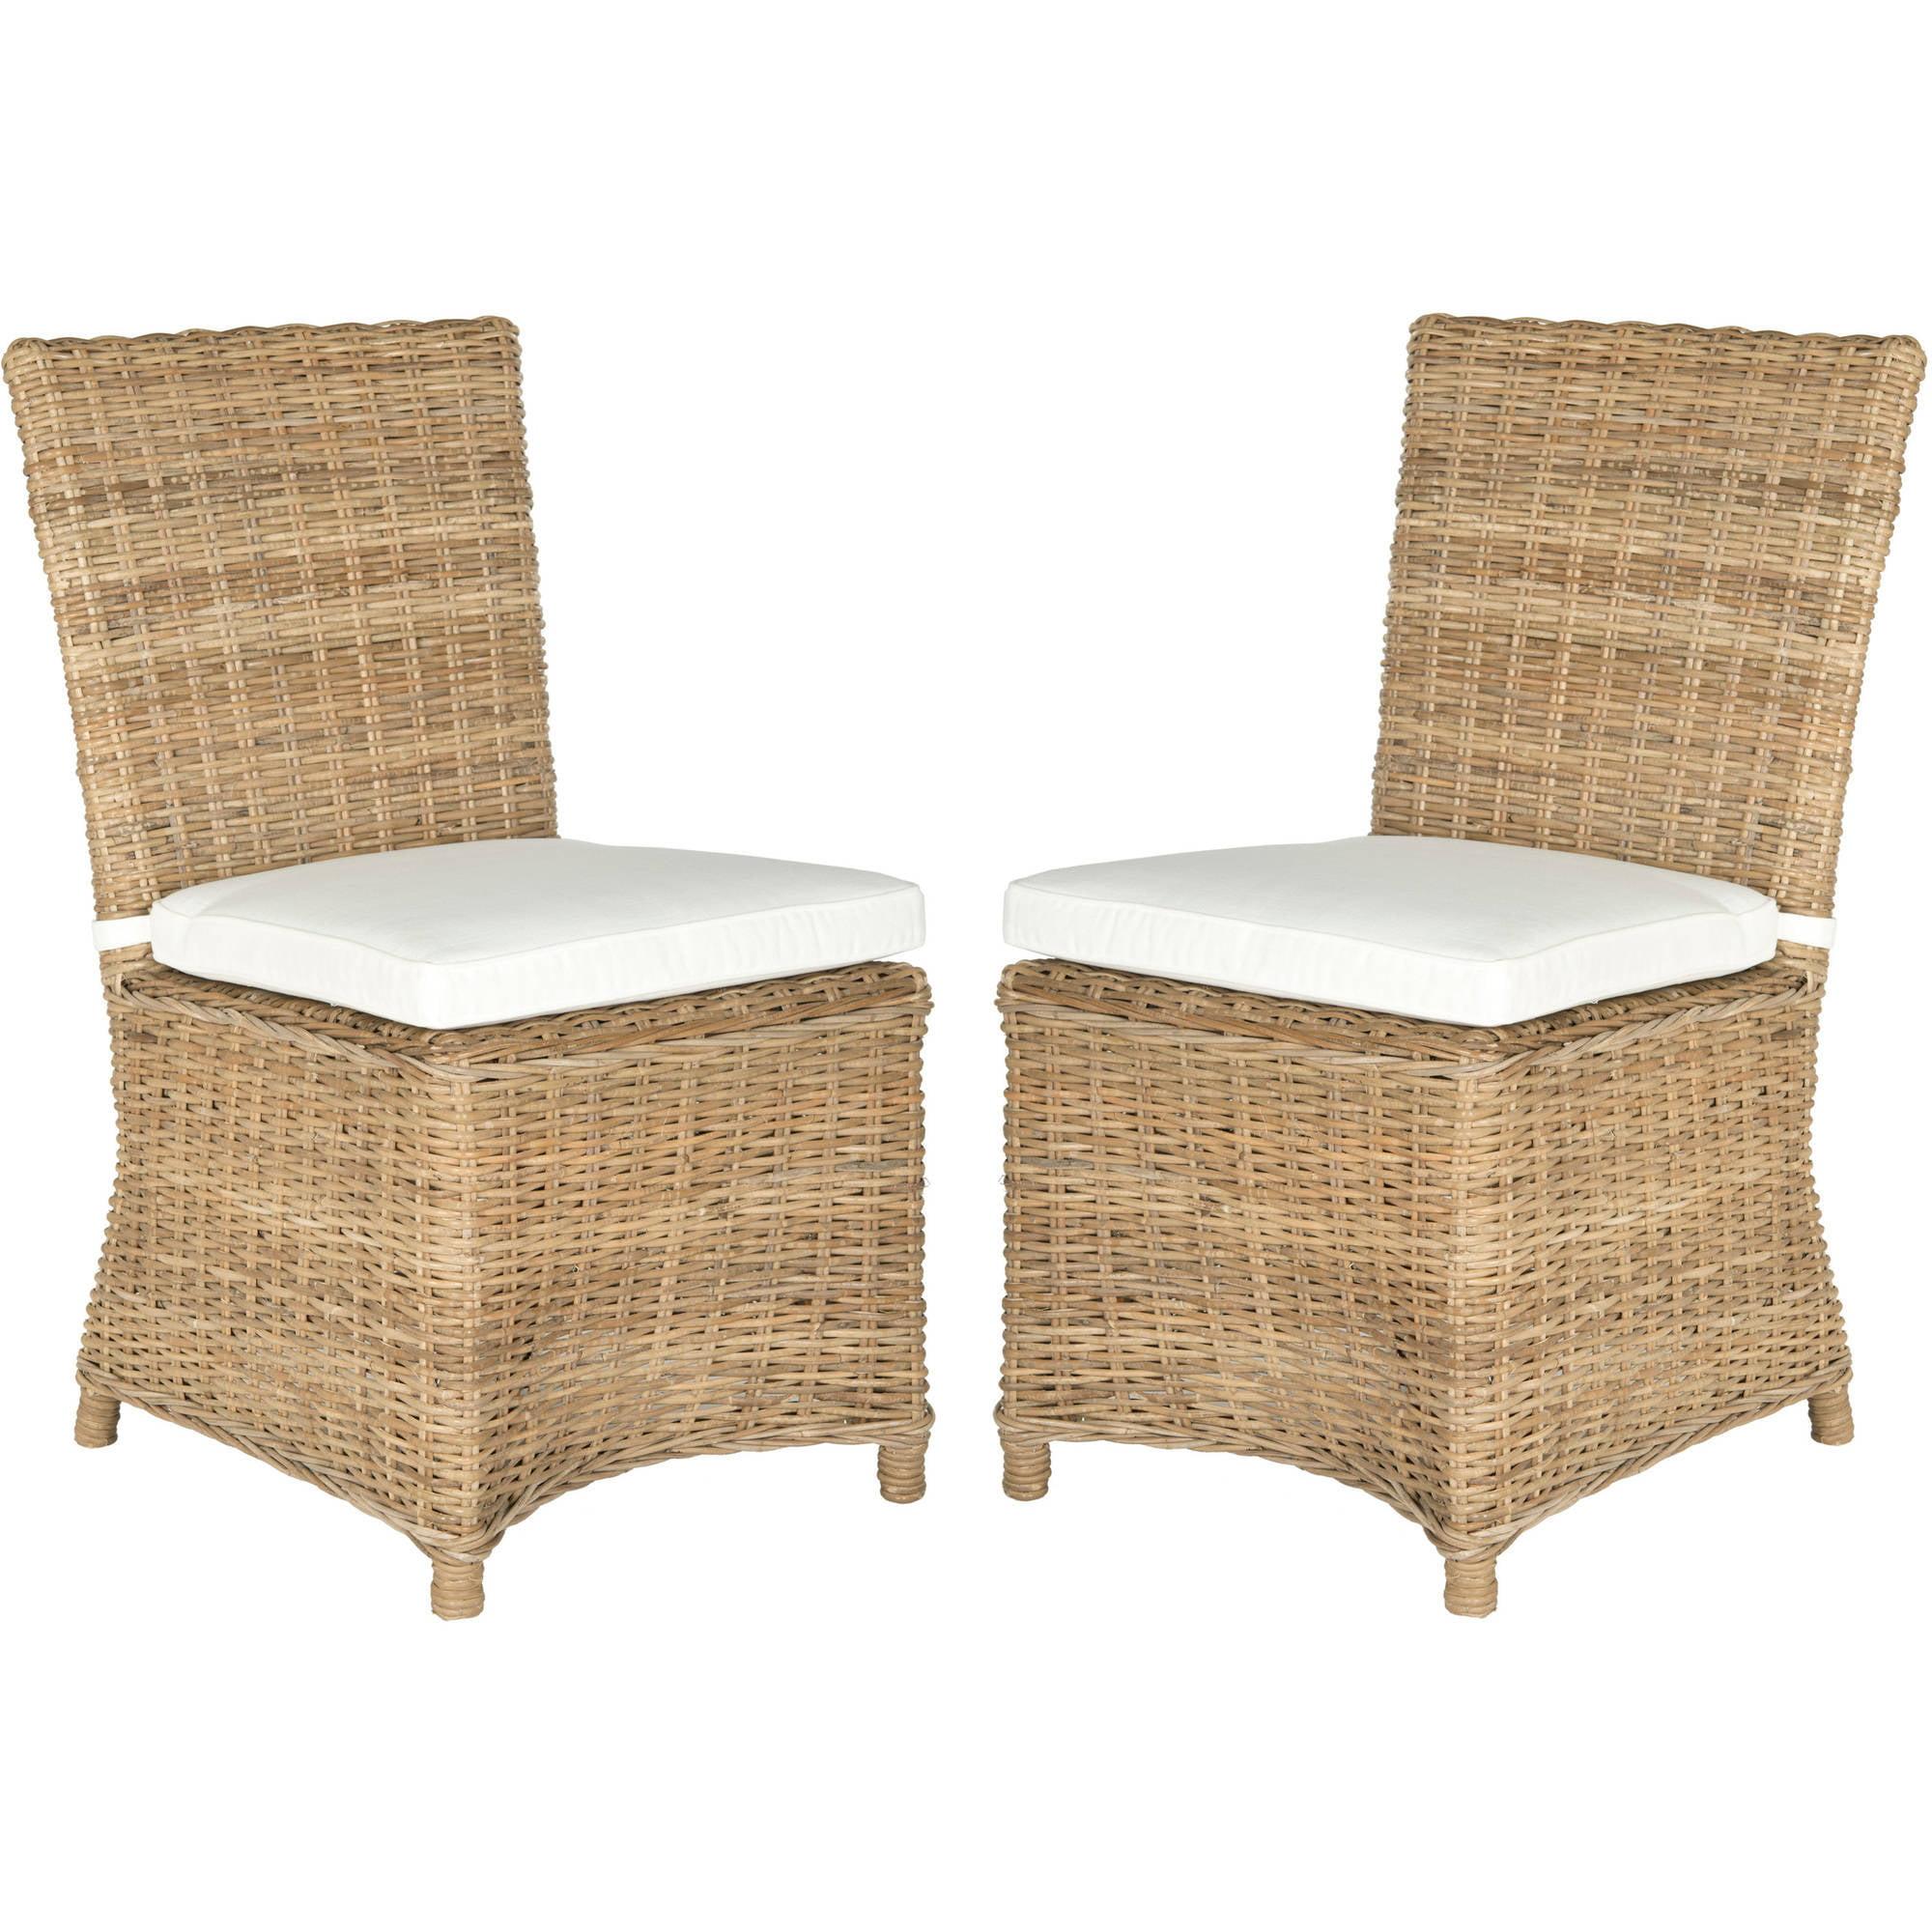 Safavieh Sebesi Side Chair, Natural, Set of 2